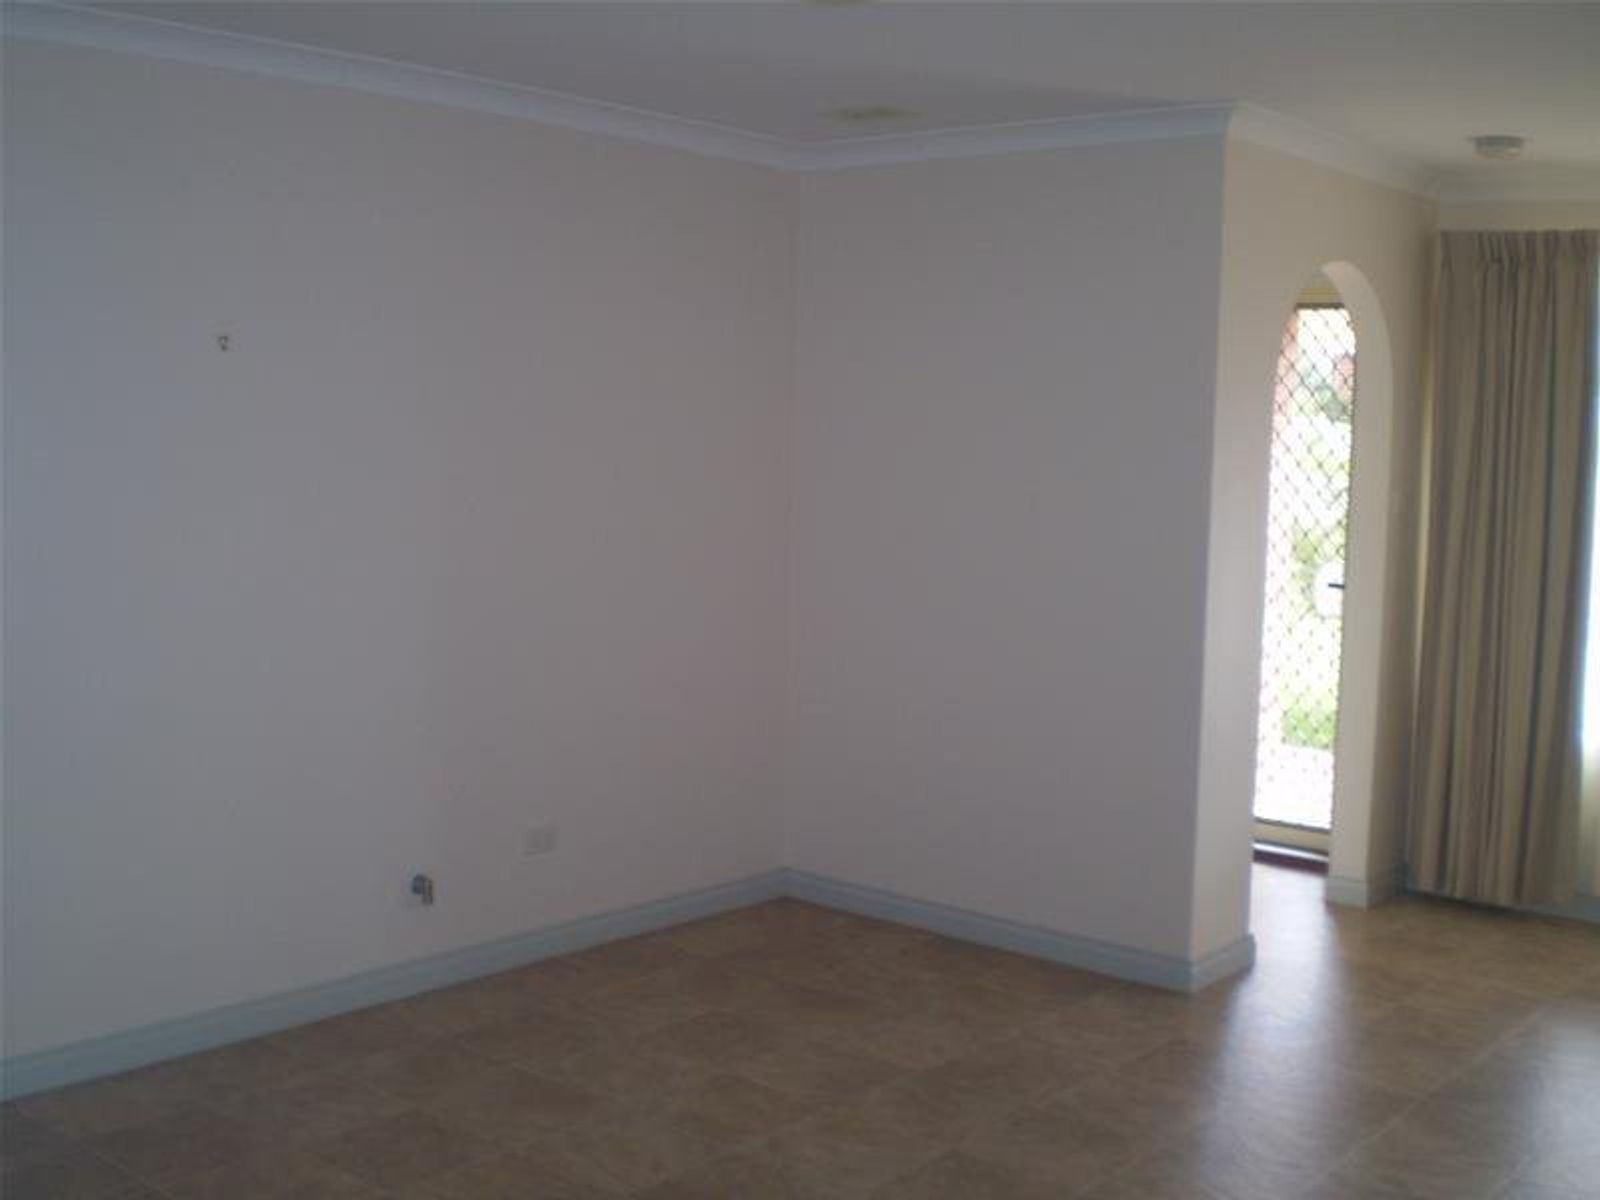 4 Eleanor Street, Mount Melville, WA 6330